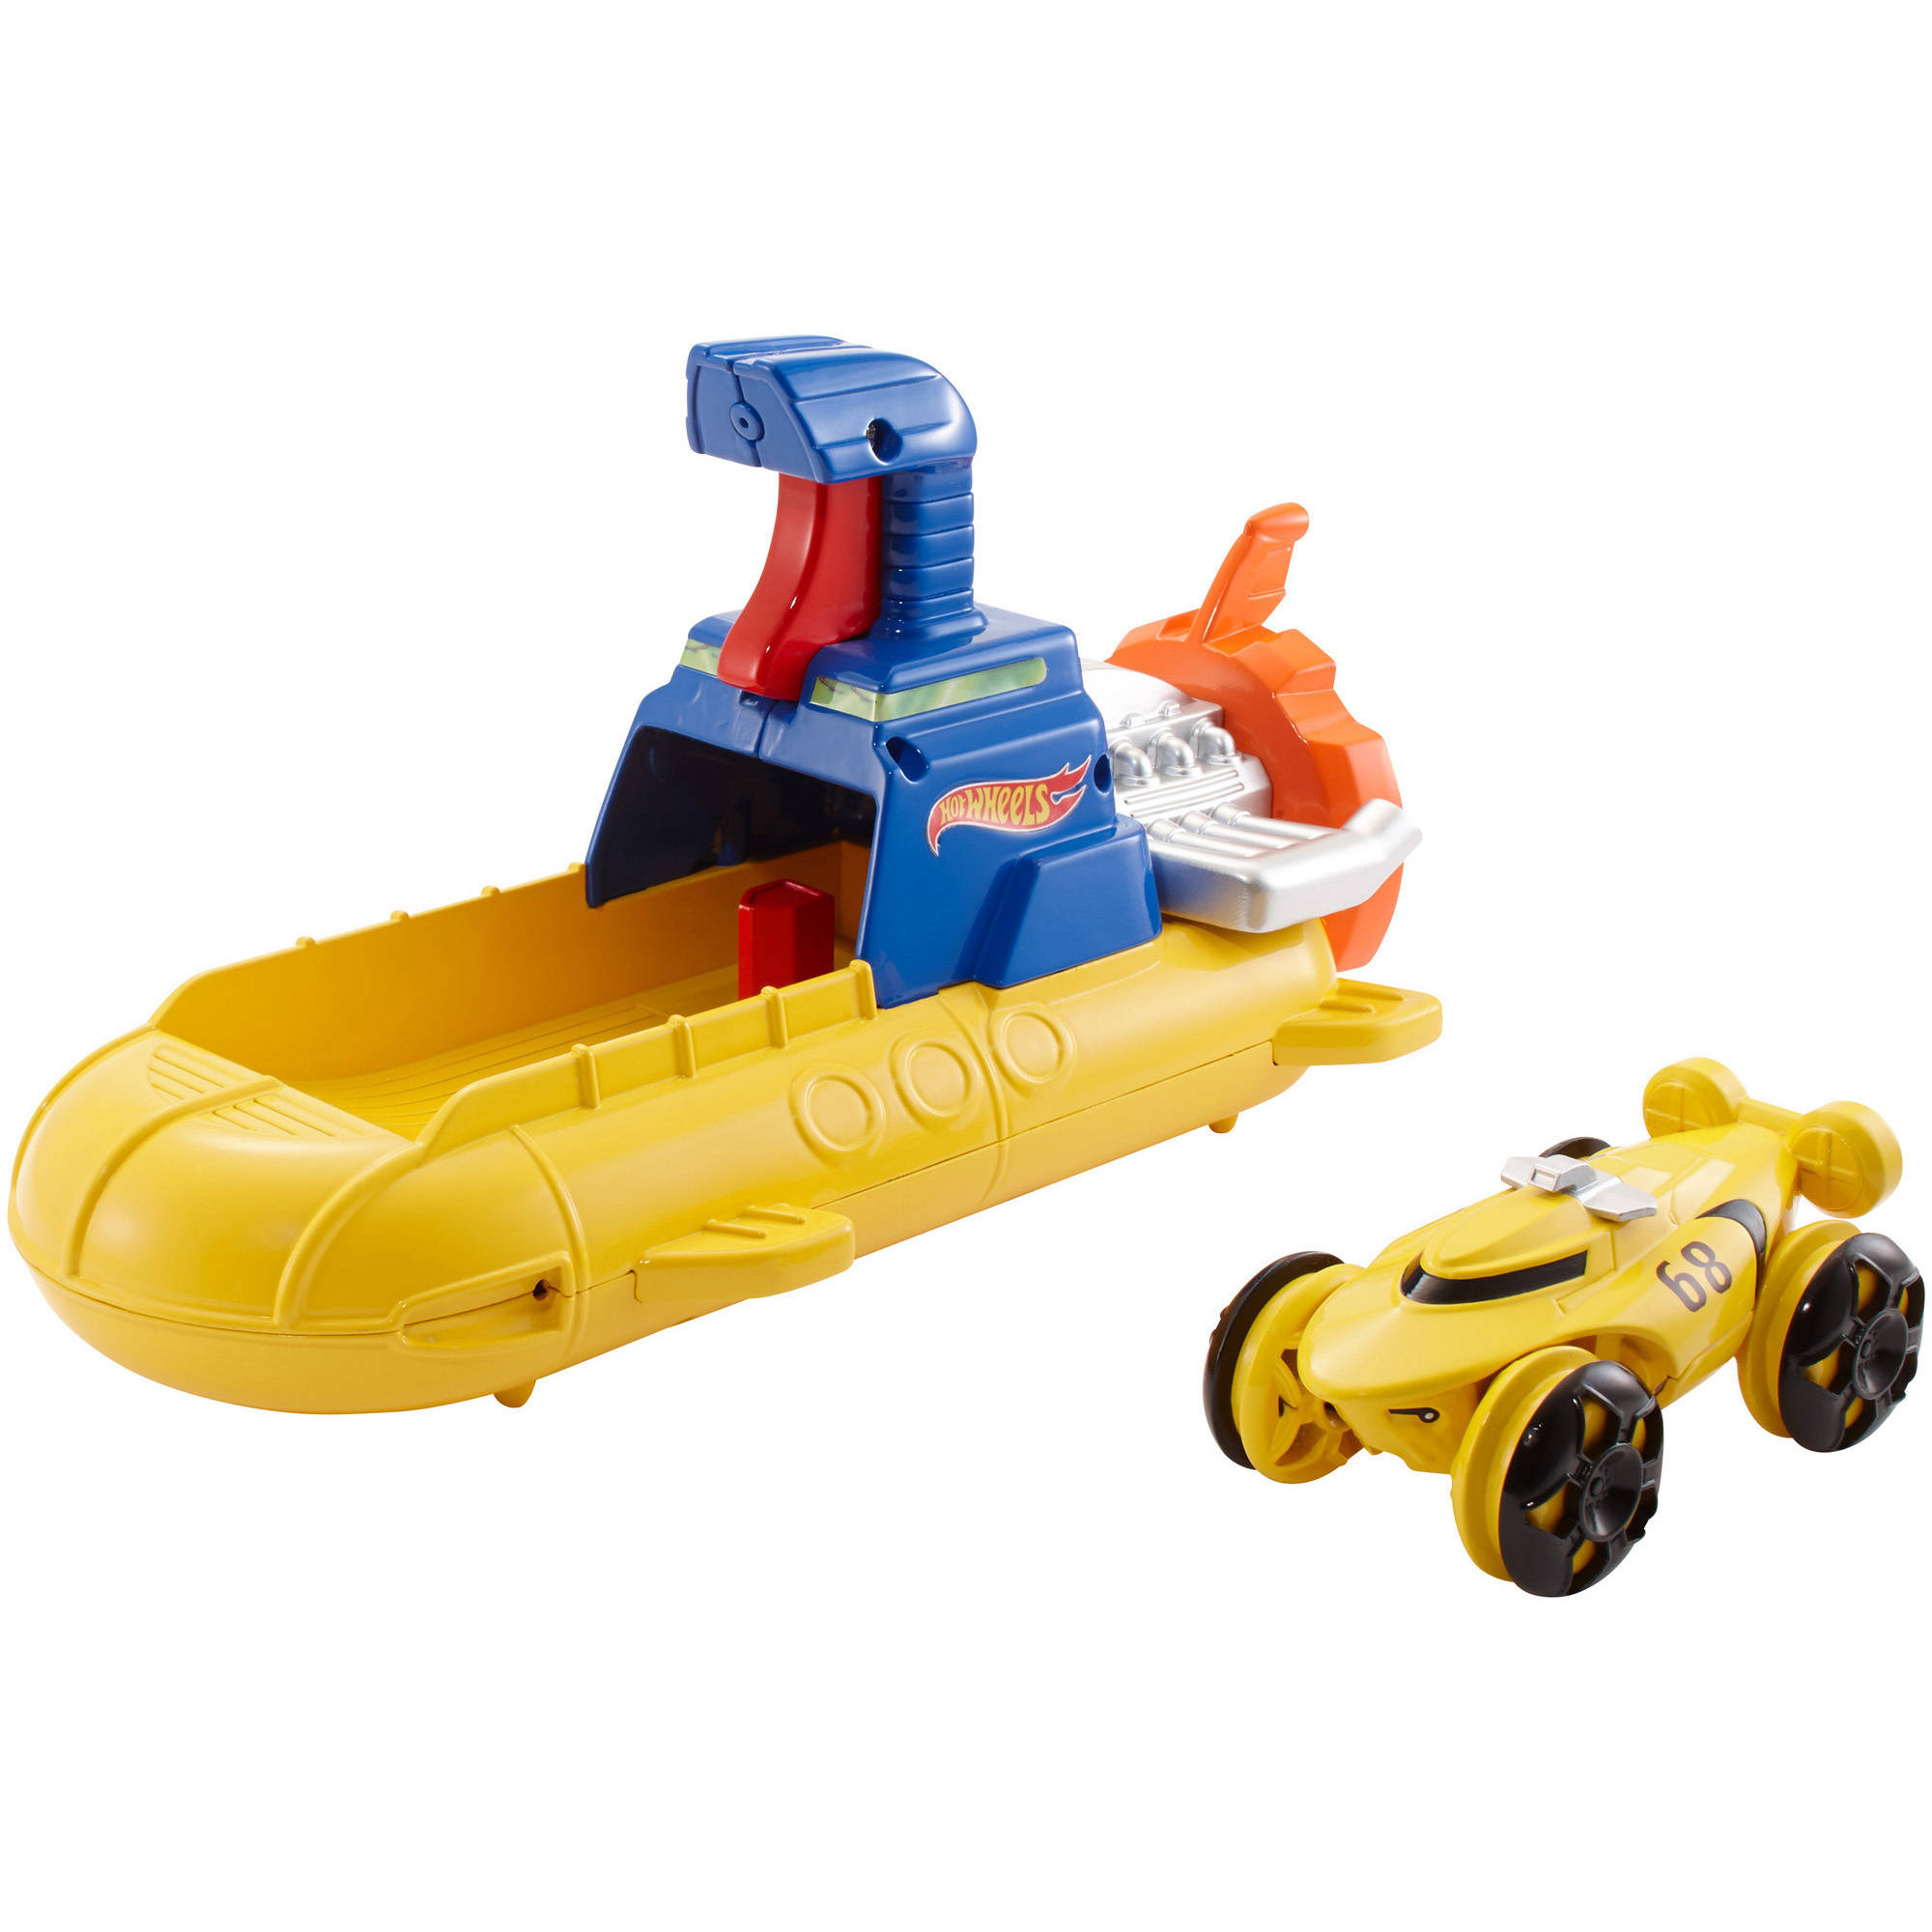 Hot Wheels Splash Rides Blastin Sub Vehicle by Mattel